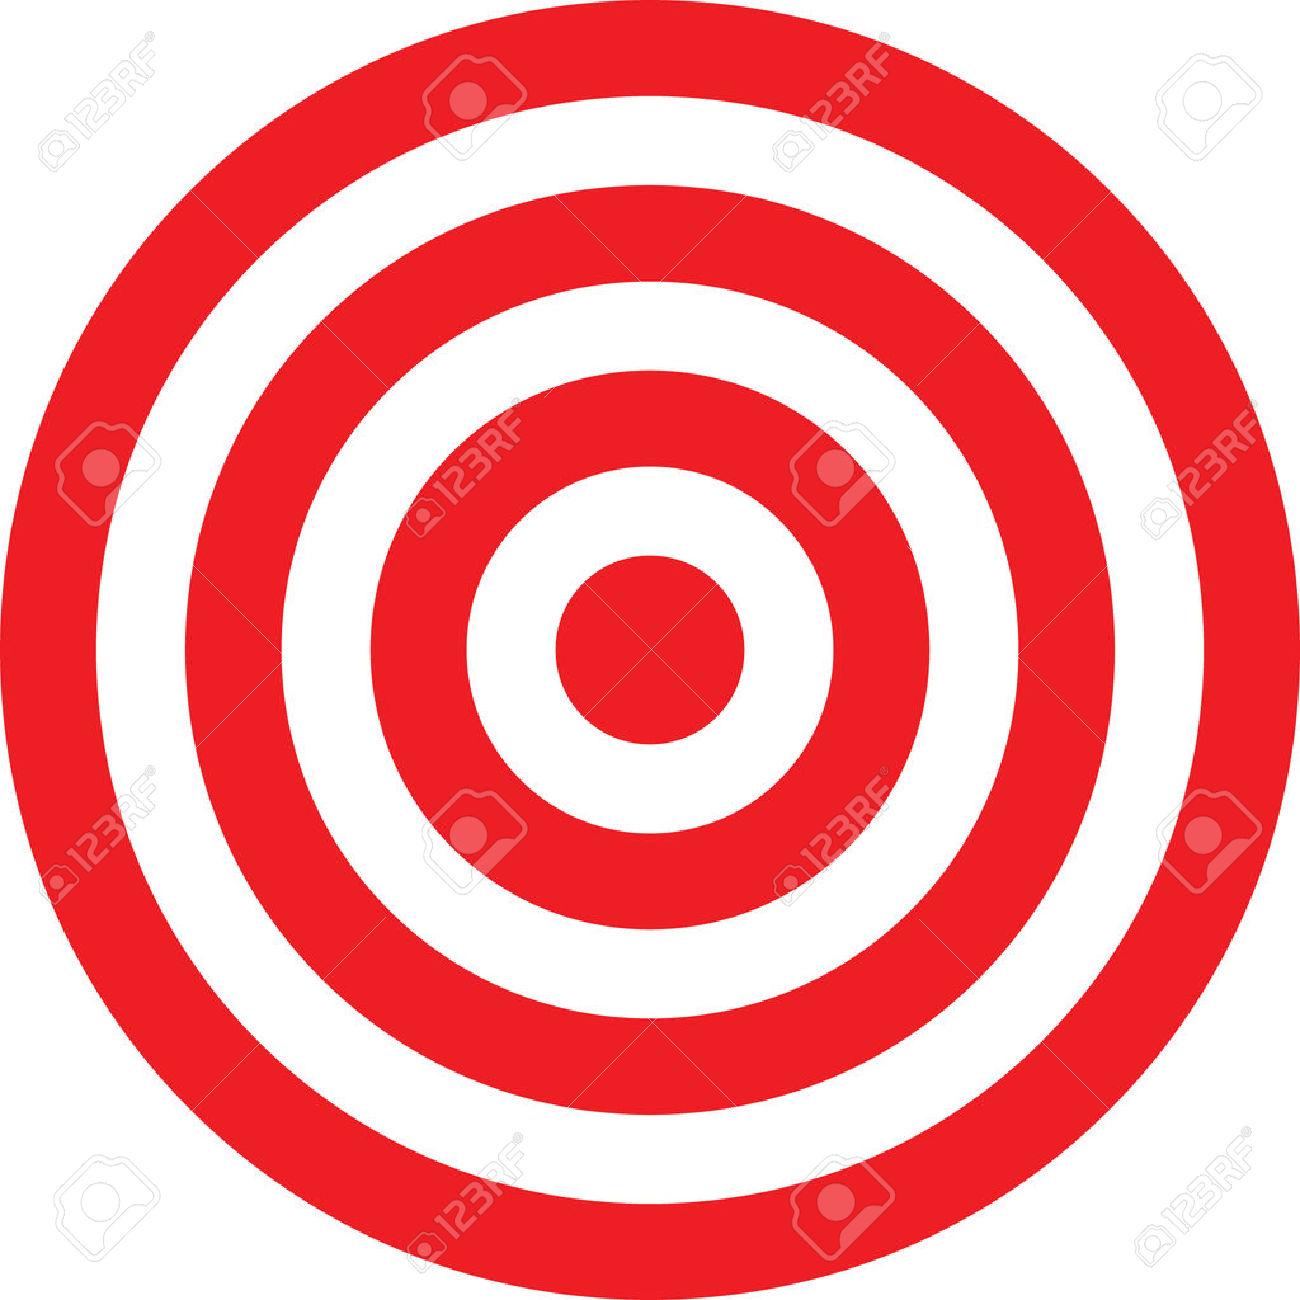 Target Clipart Target Clipart Transparent